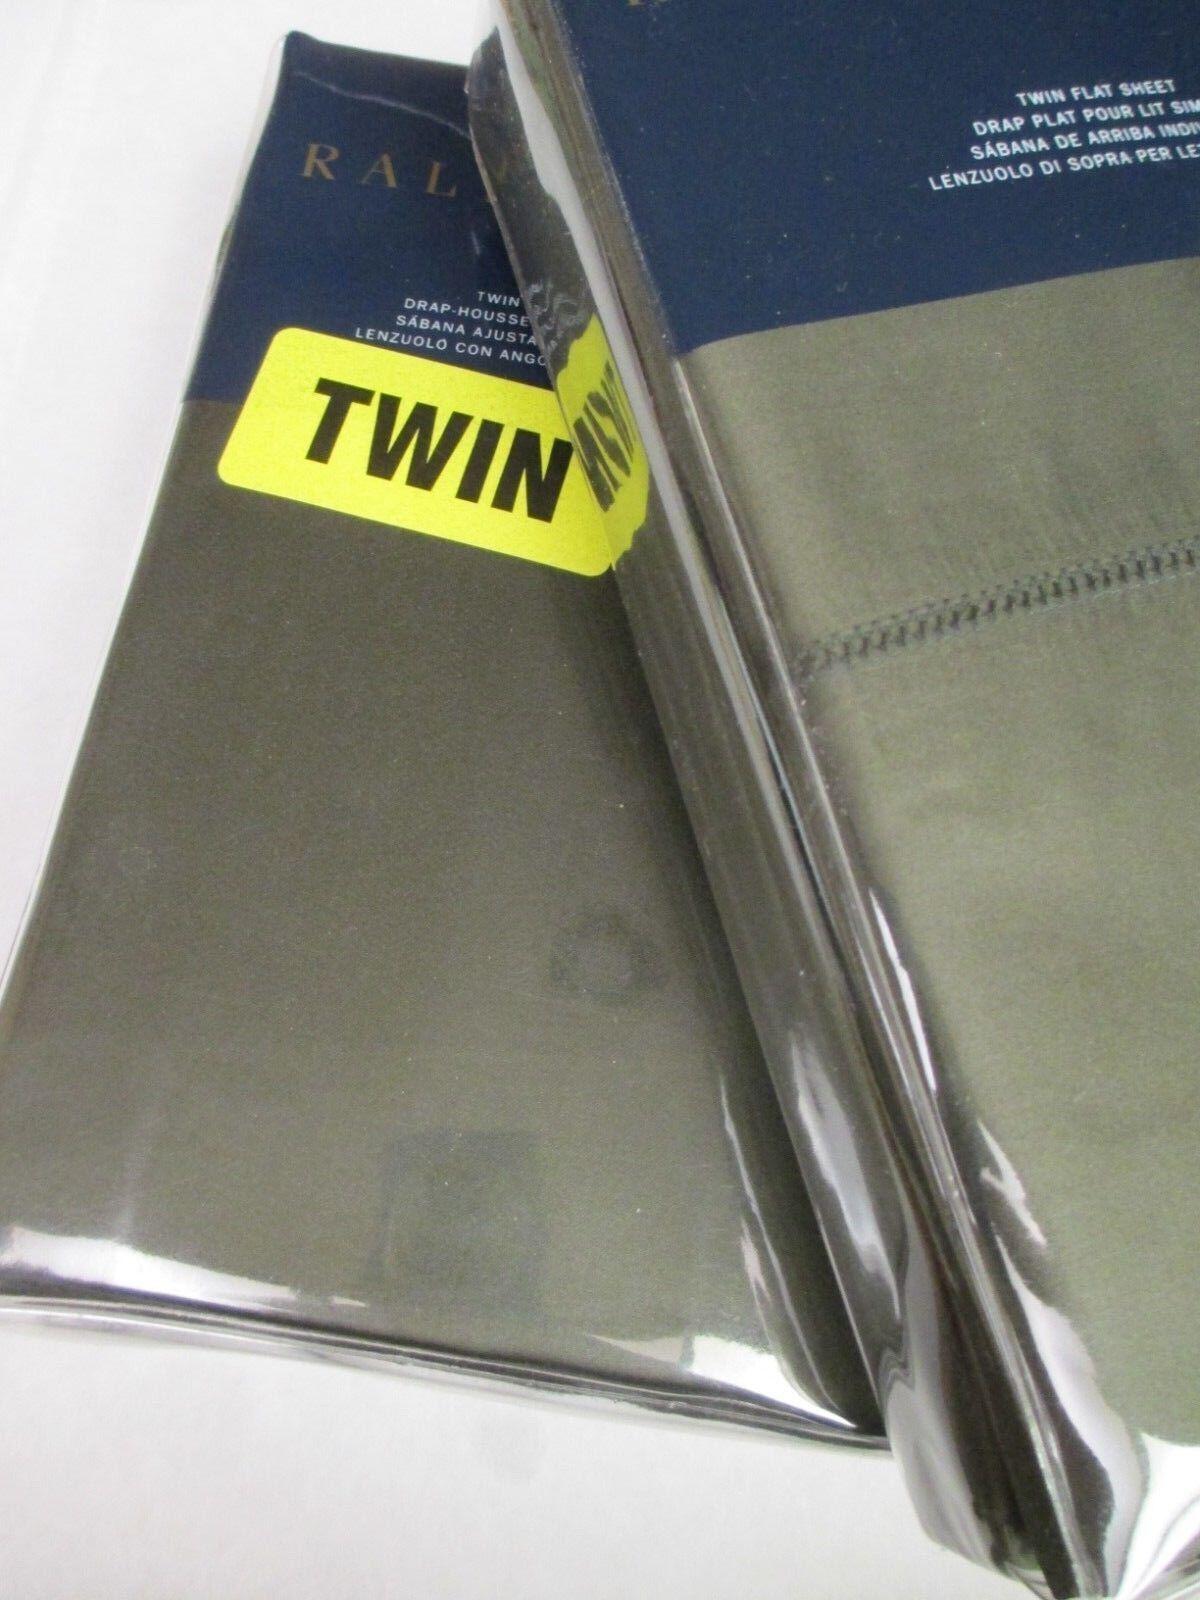 Ralph Lauren 624 Solid Sateen Tweed verde 2pc Flat & Fitted Sheets - Twin